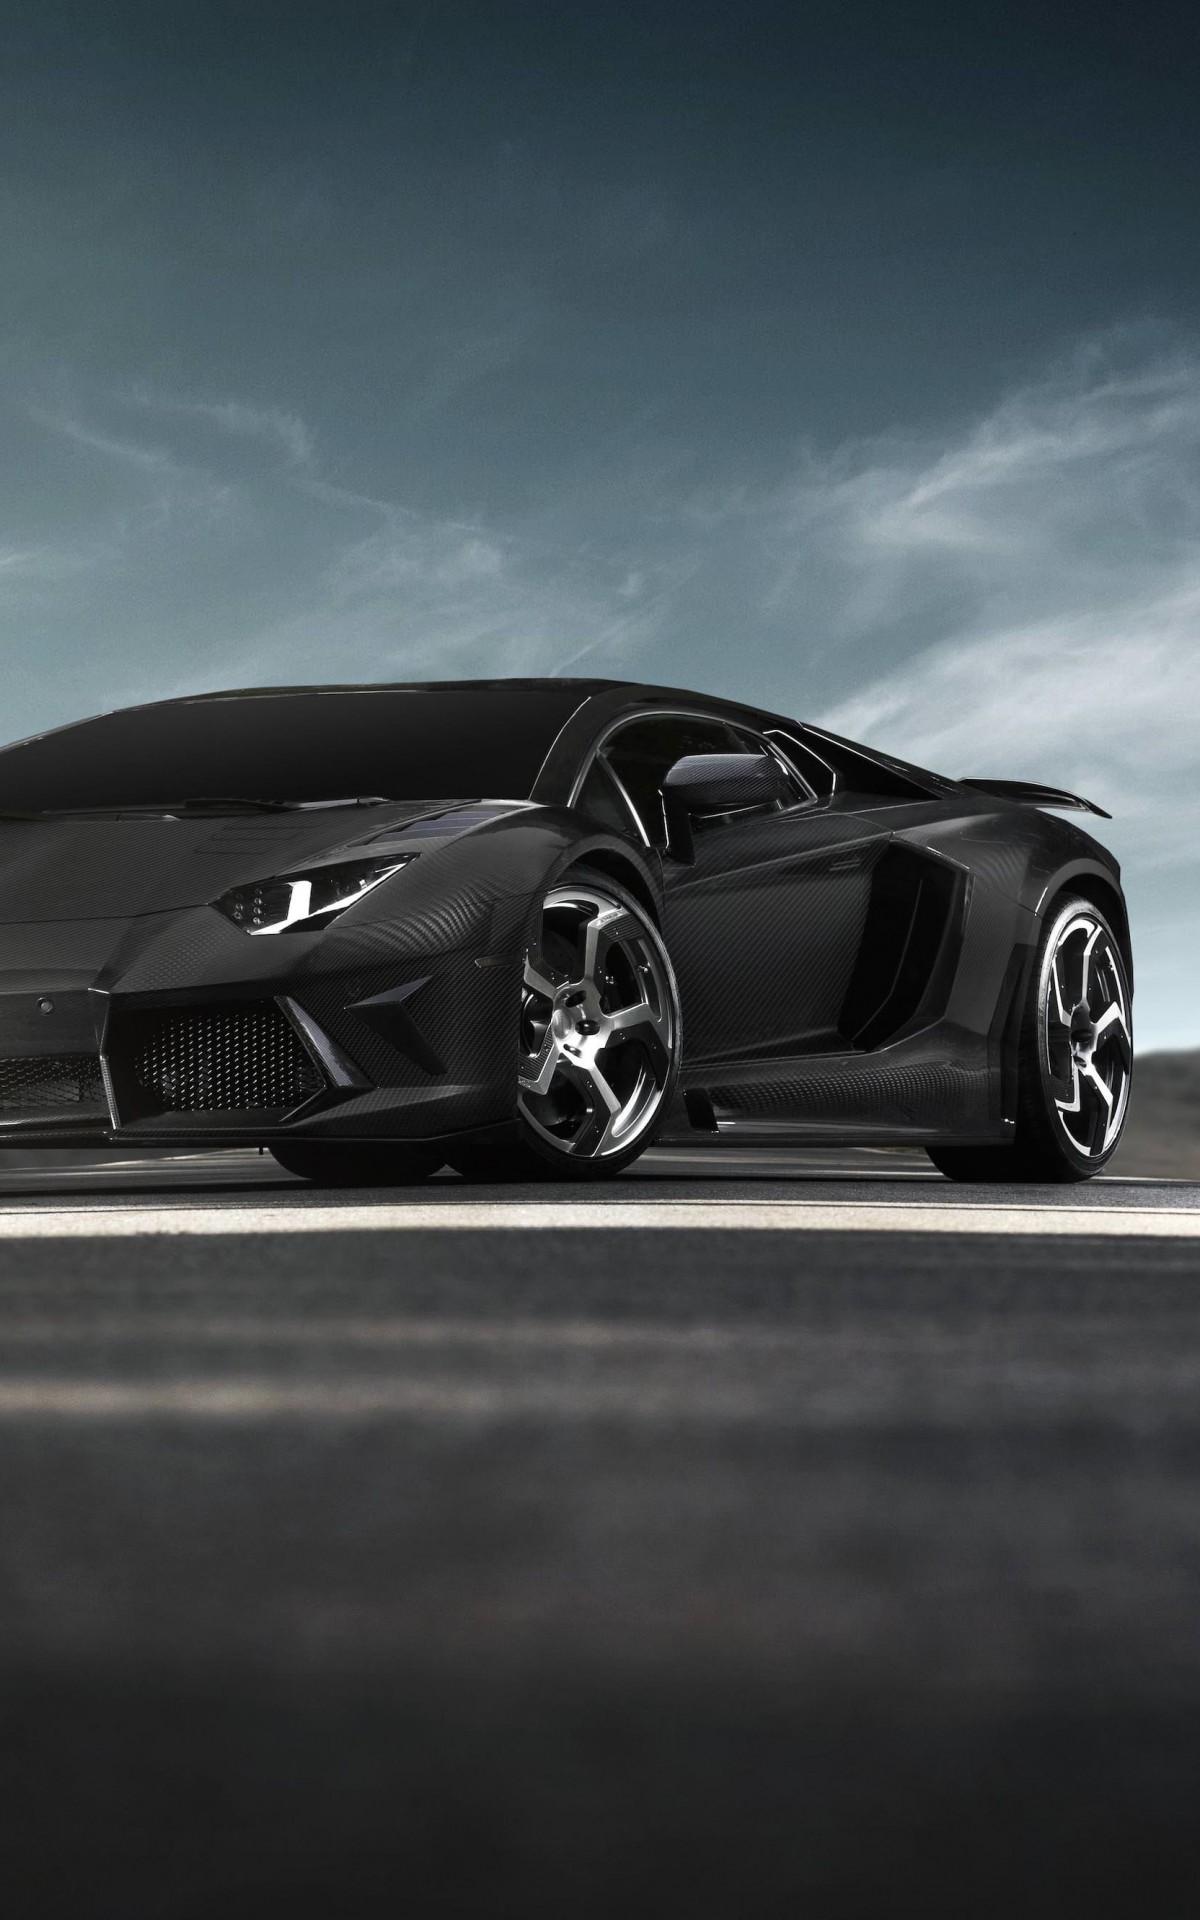 Mansory Carbonado Lamborghini Aventador Lp700 4 Hd Wallpaper For Kindle Fire Hdx Screens